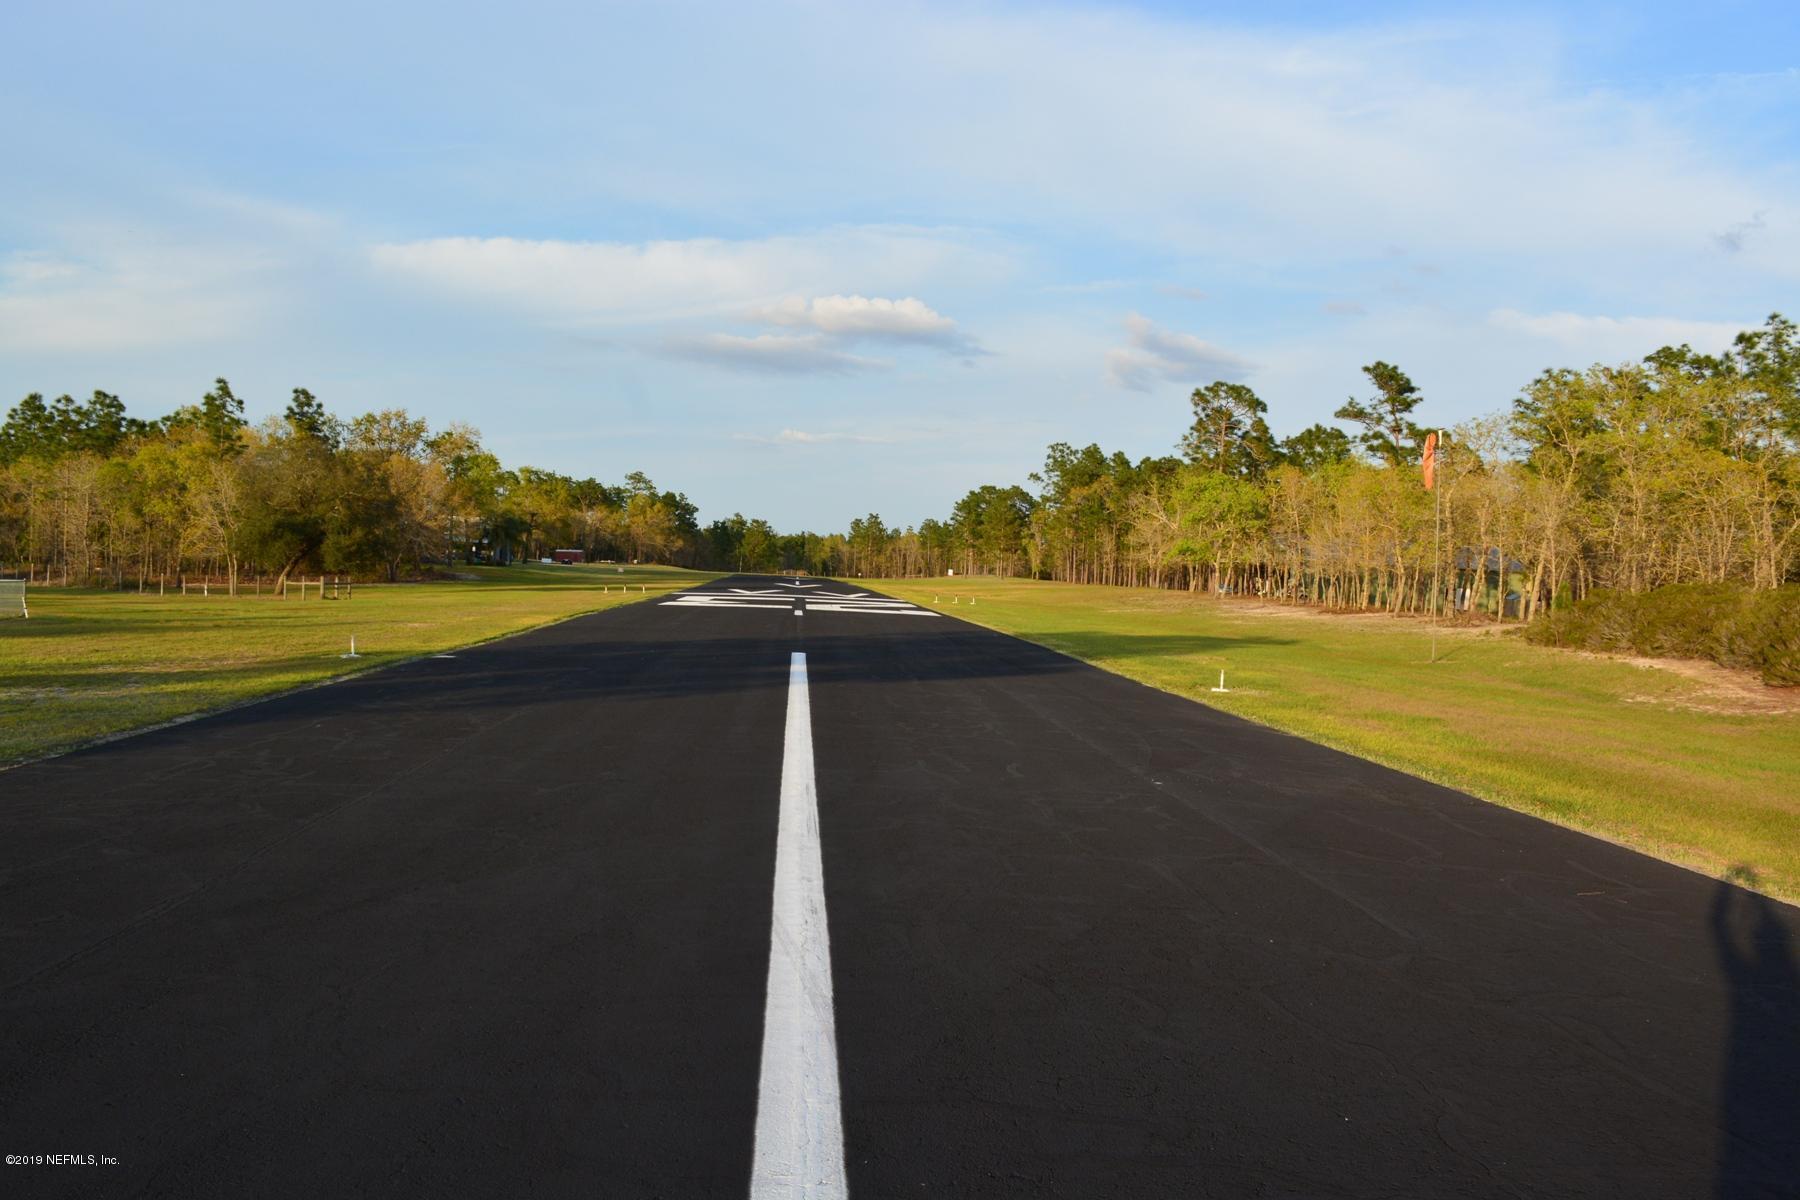 000 MELROSE LANDING, HAWTHORNE, FLORIDA 32640, ,Vacant land,For sale,MELROSE LANDING,1000900